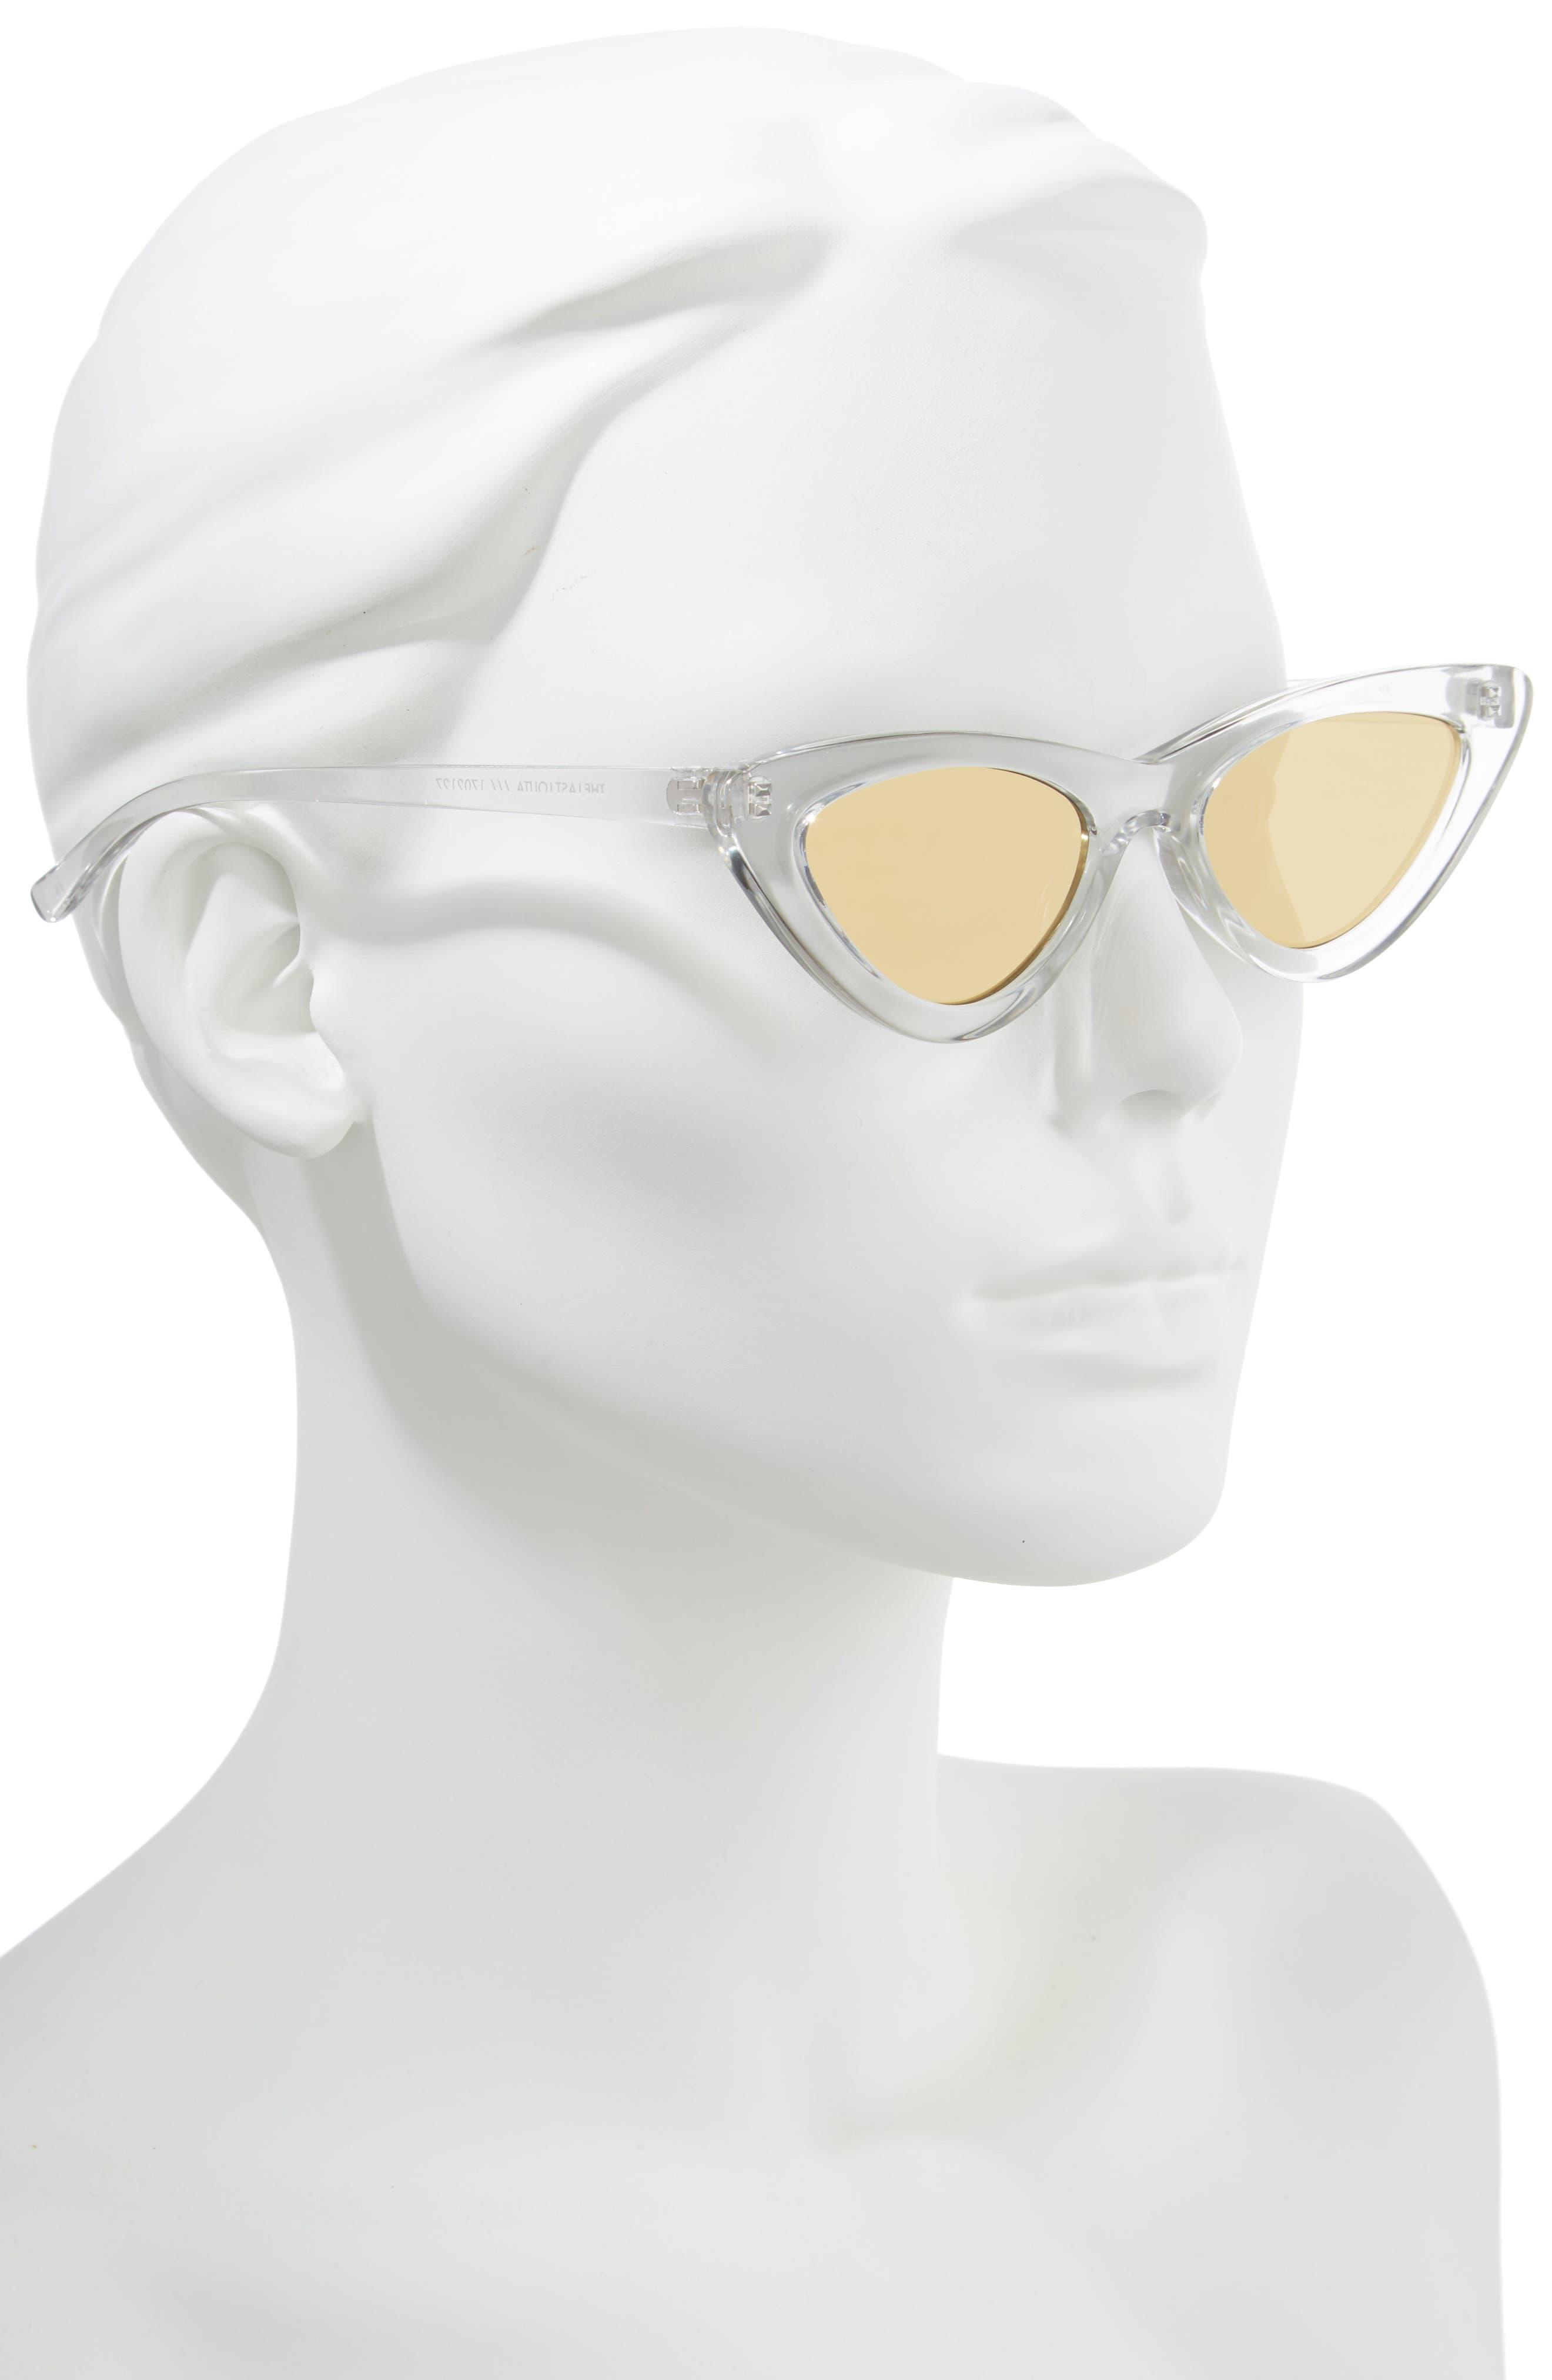 Lolita 49mm Cat Eye Sunglasses,                             Alternate thumbnail 2, color,                             CRYSTAL GREY